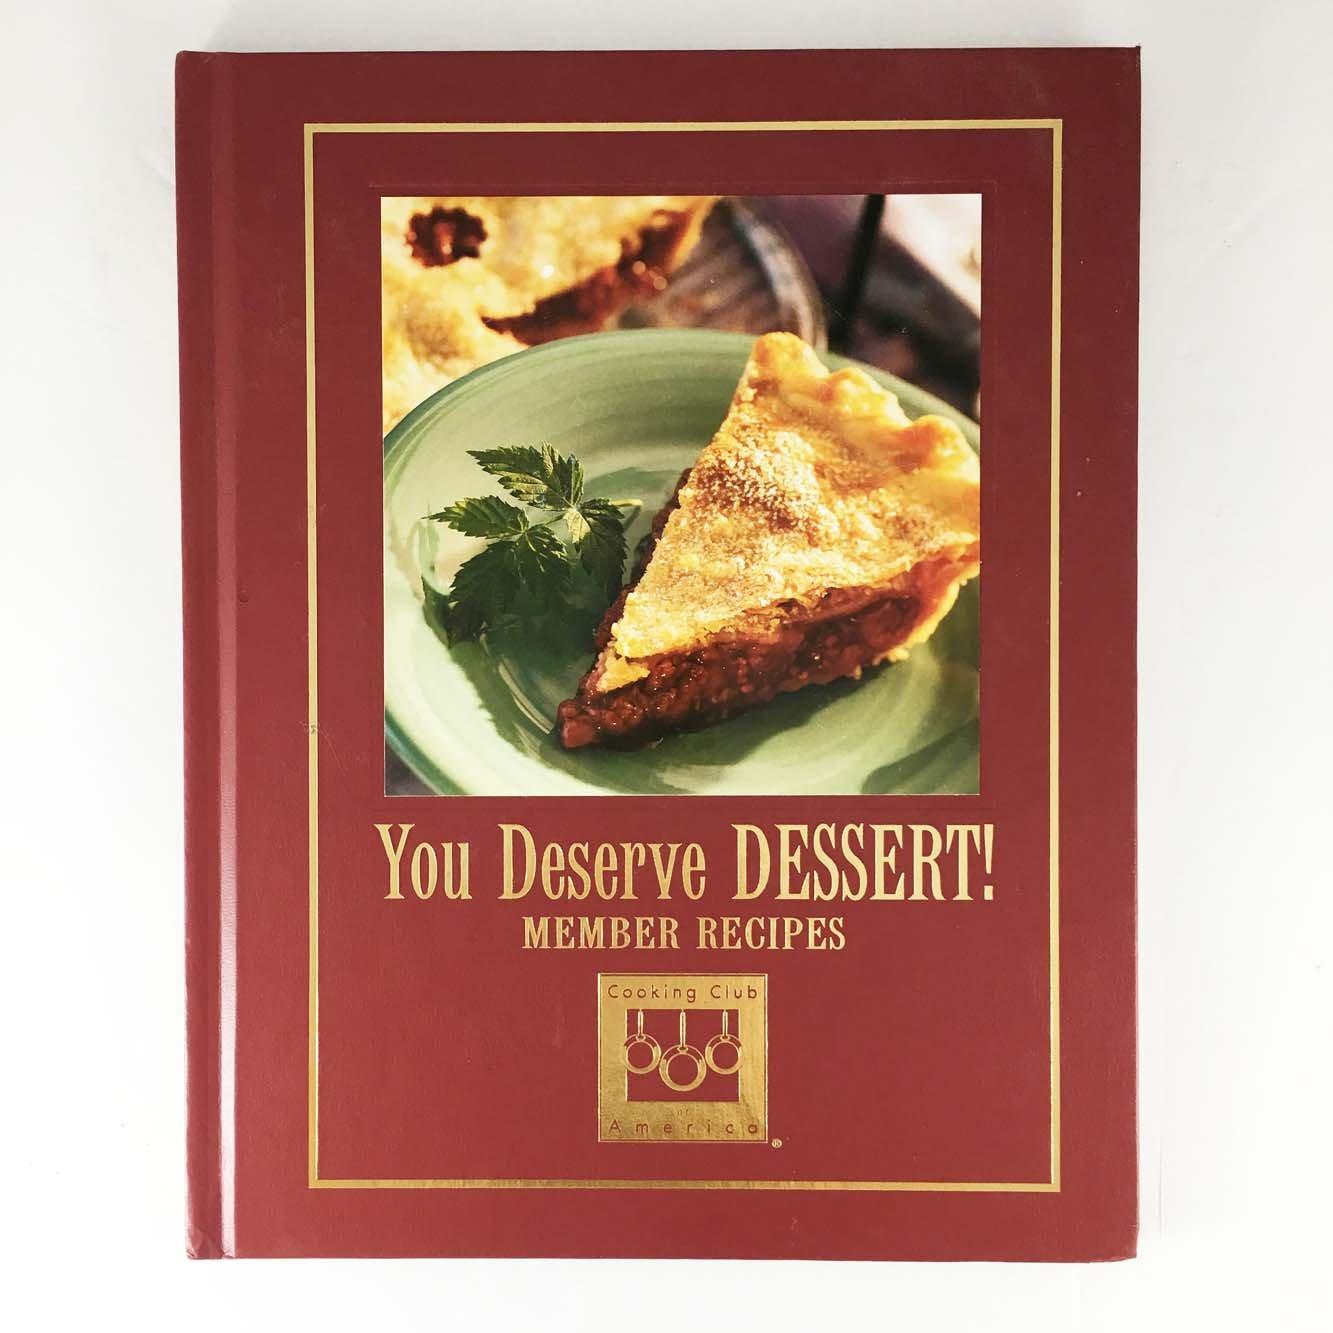 You Deserve Dessert! - Member Recipes (Cooking Arts Collection) PDF